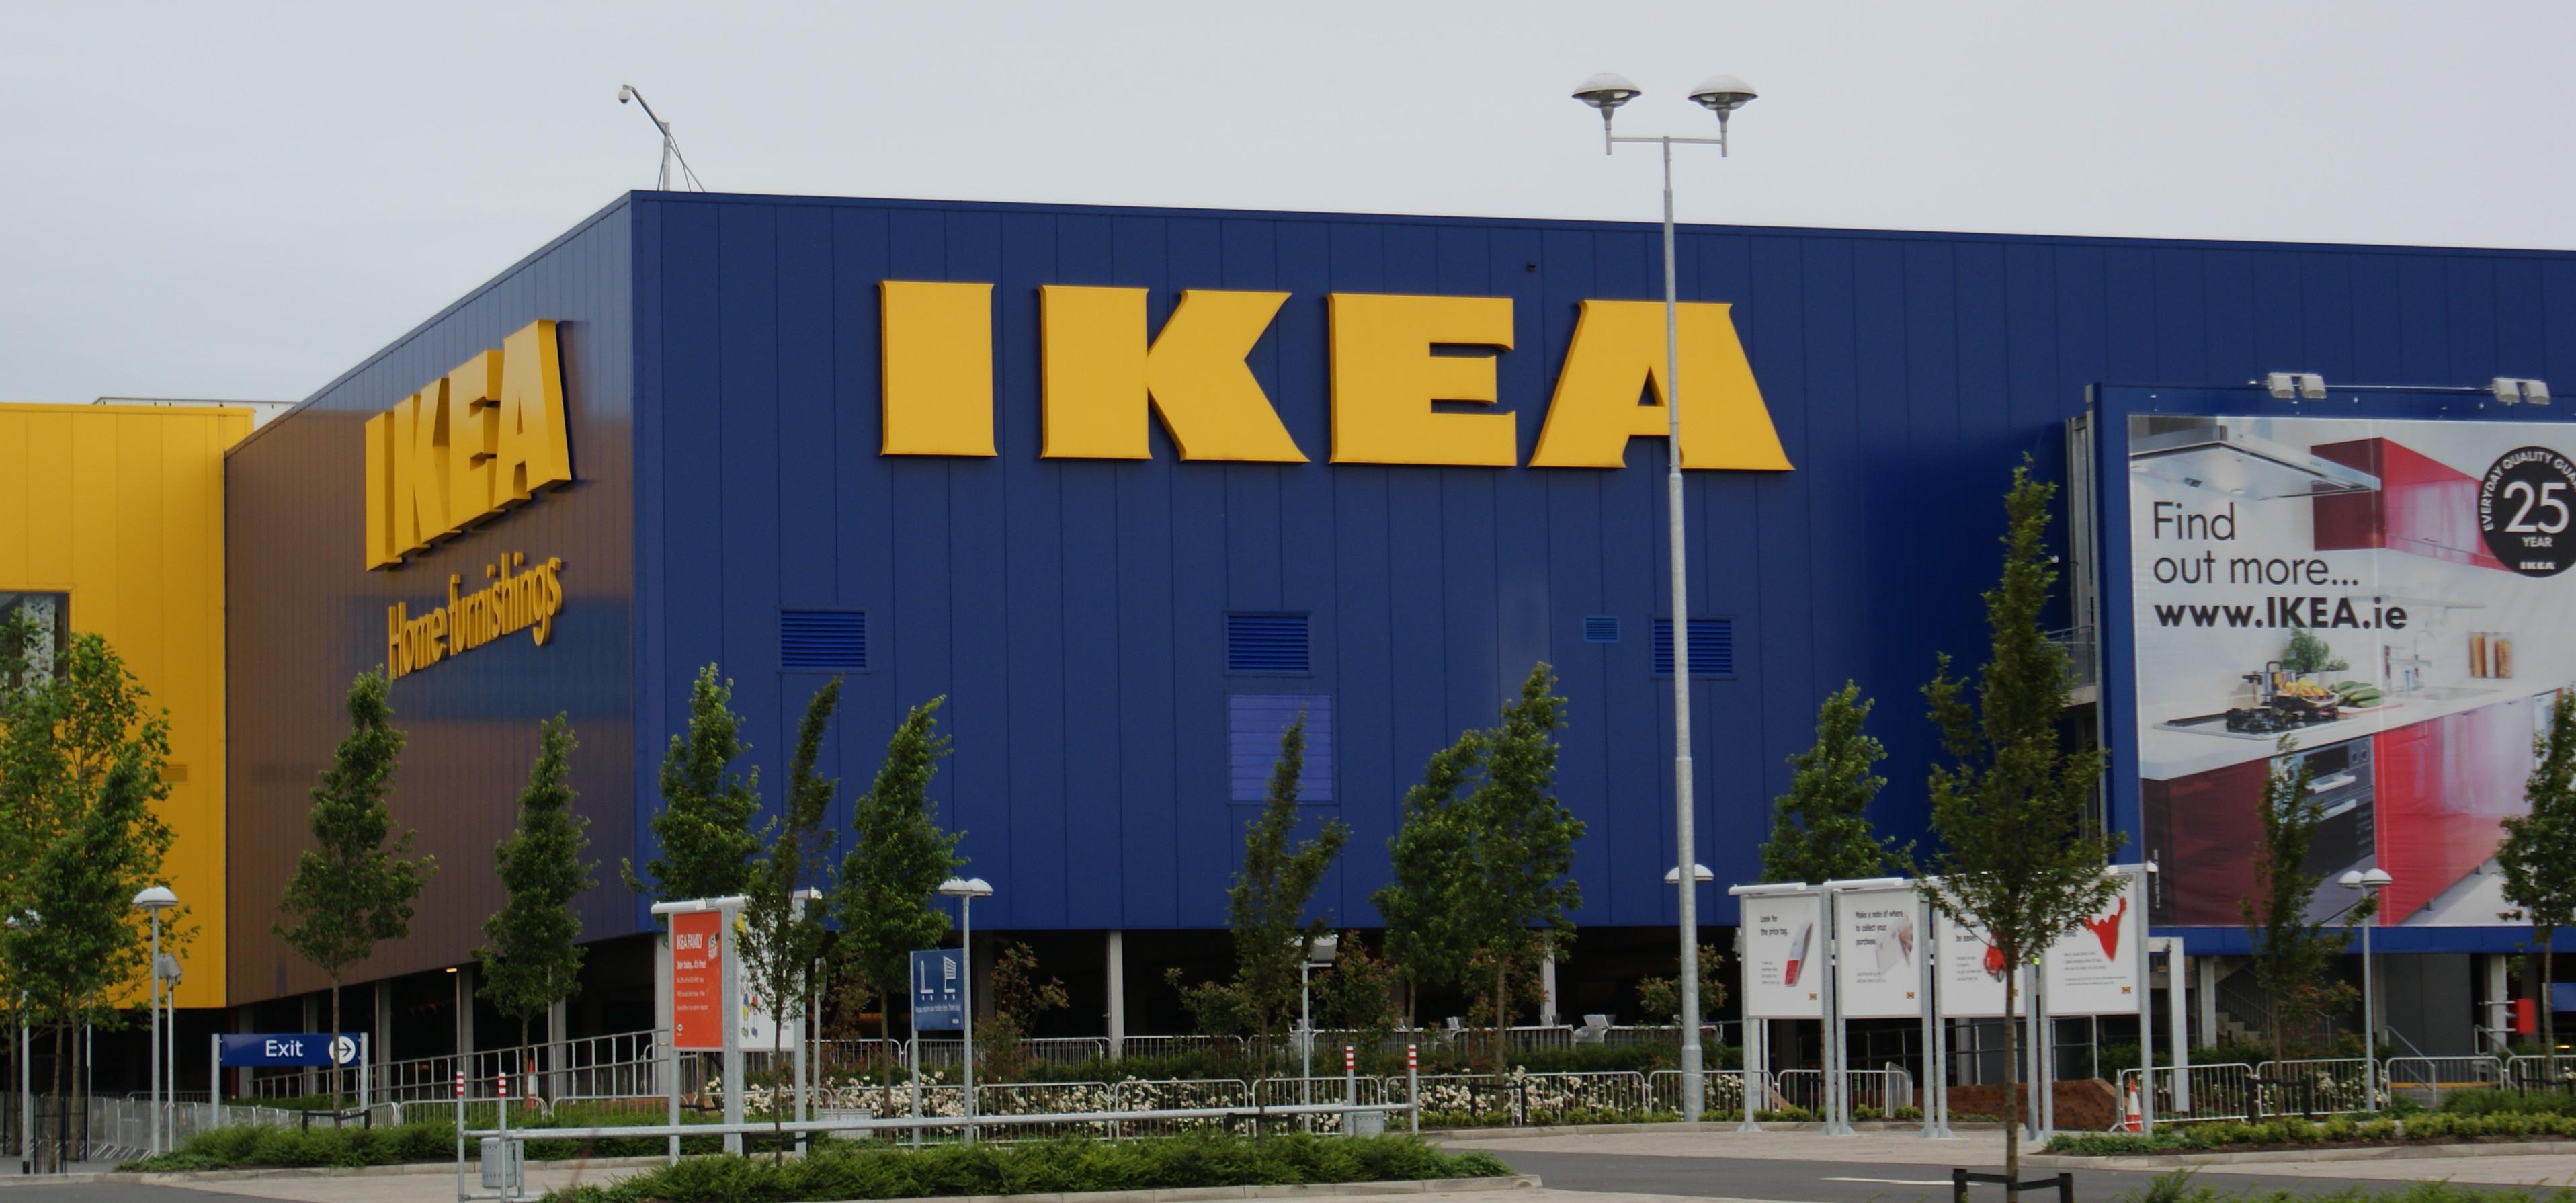 Ikea Nantes Restauration